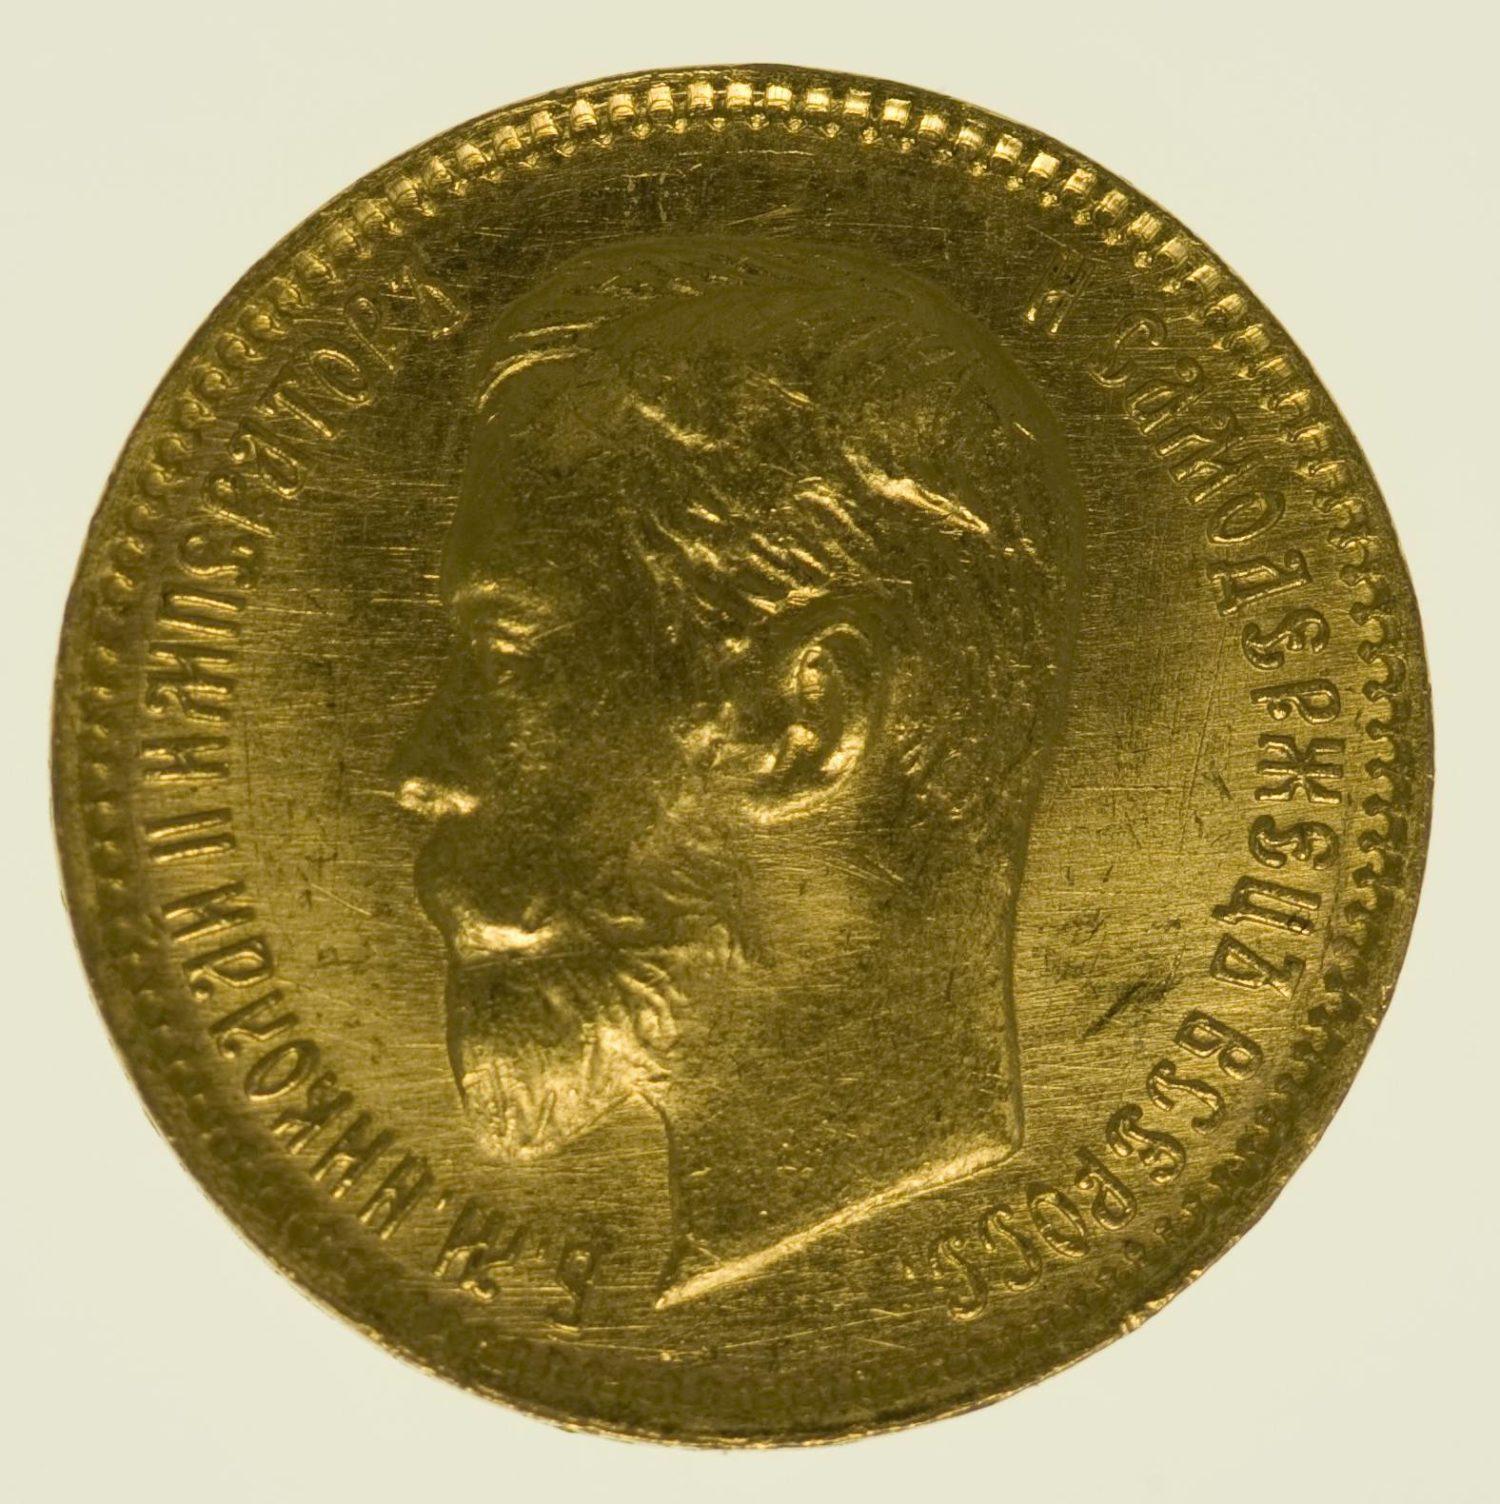 Russland Nikolaus II. 5 Rubel 1903 Gold 3,87 Gramm fein RAR